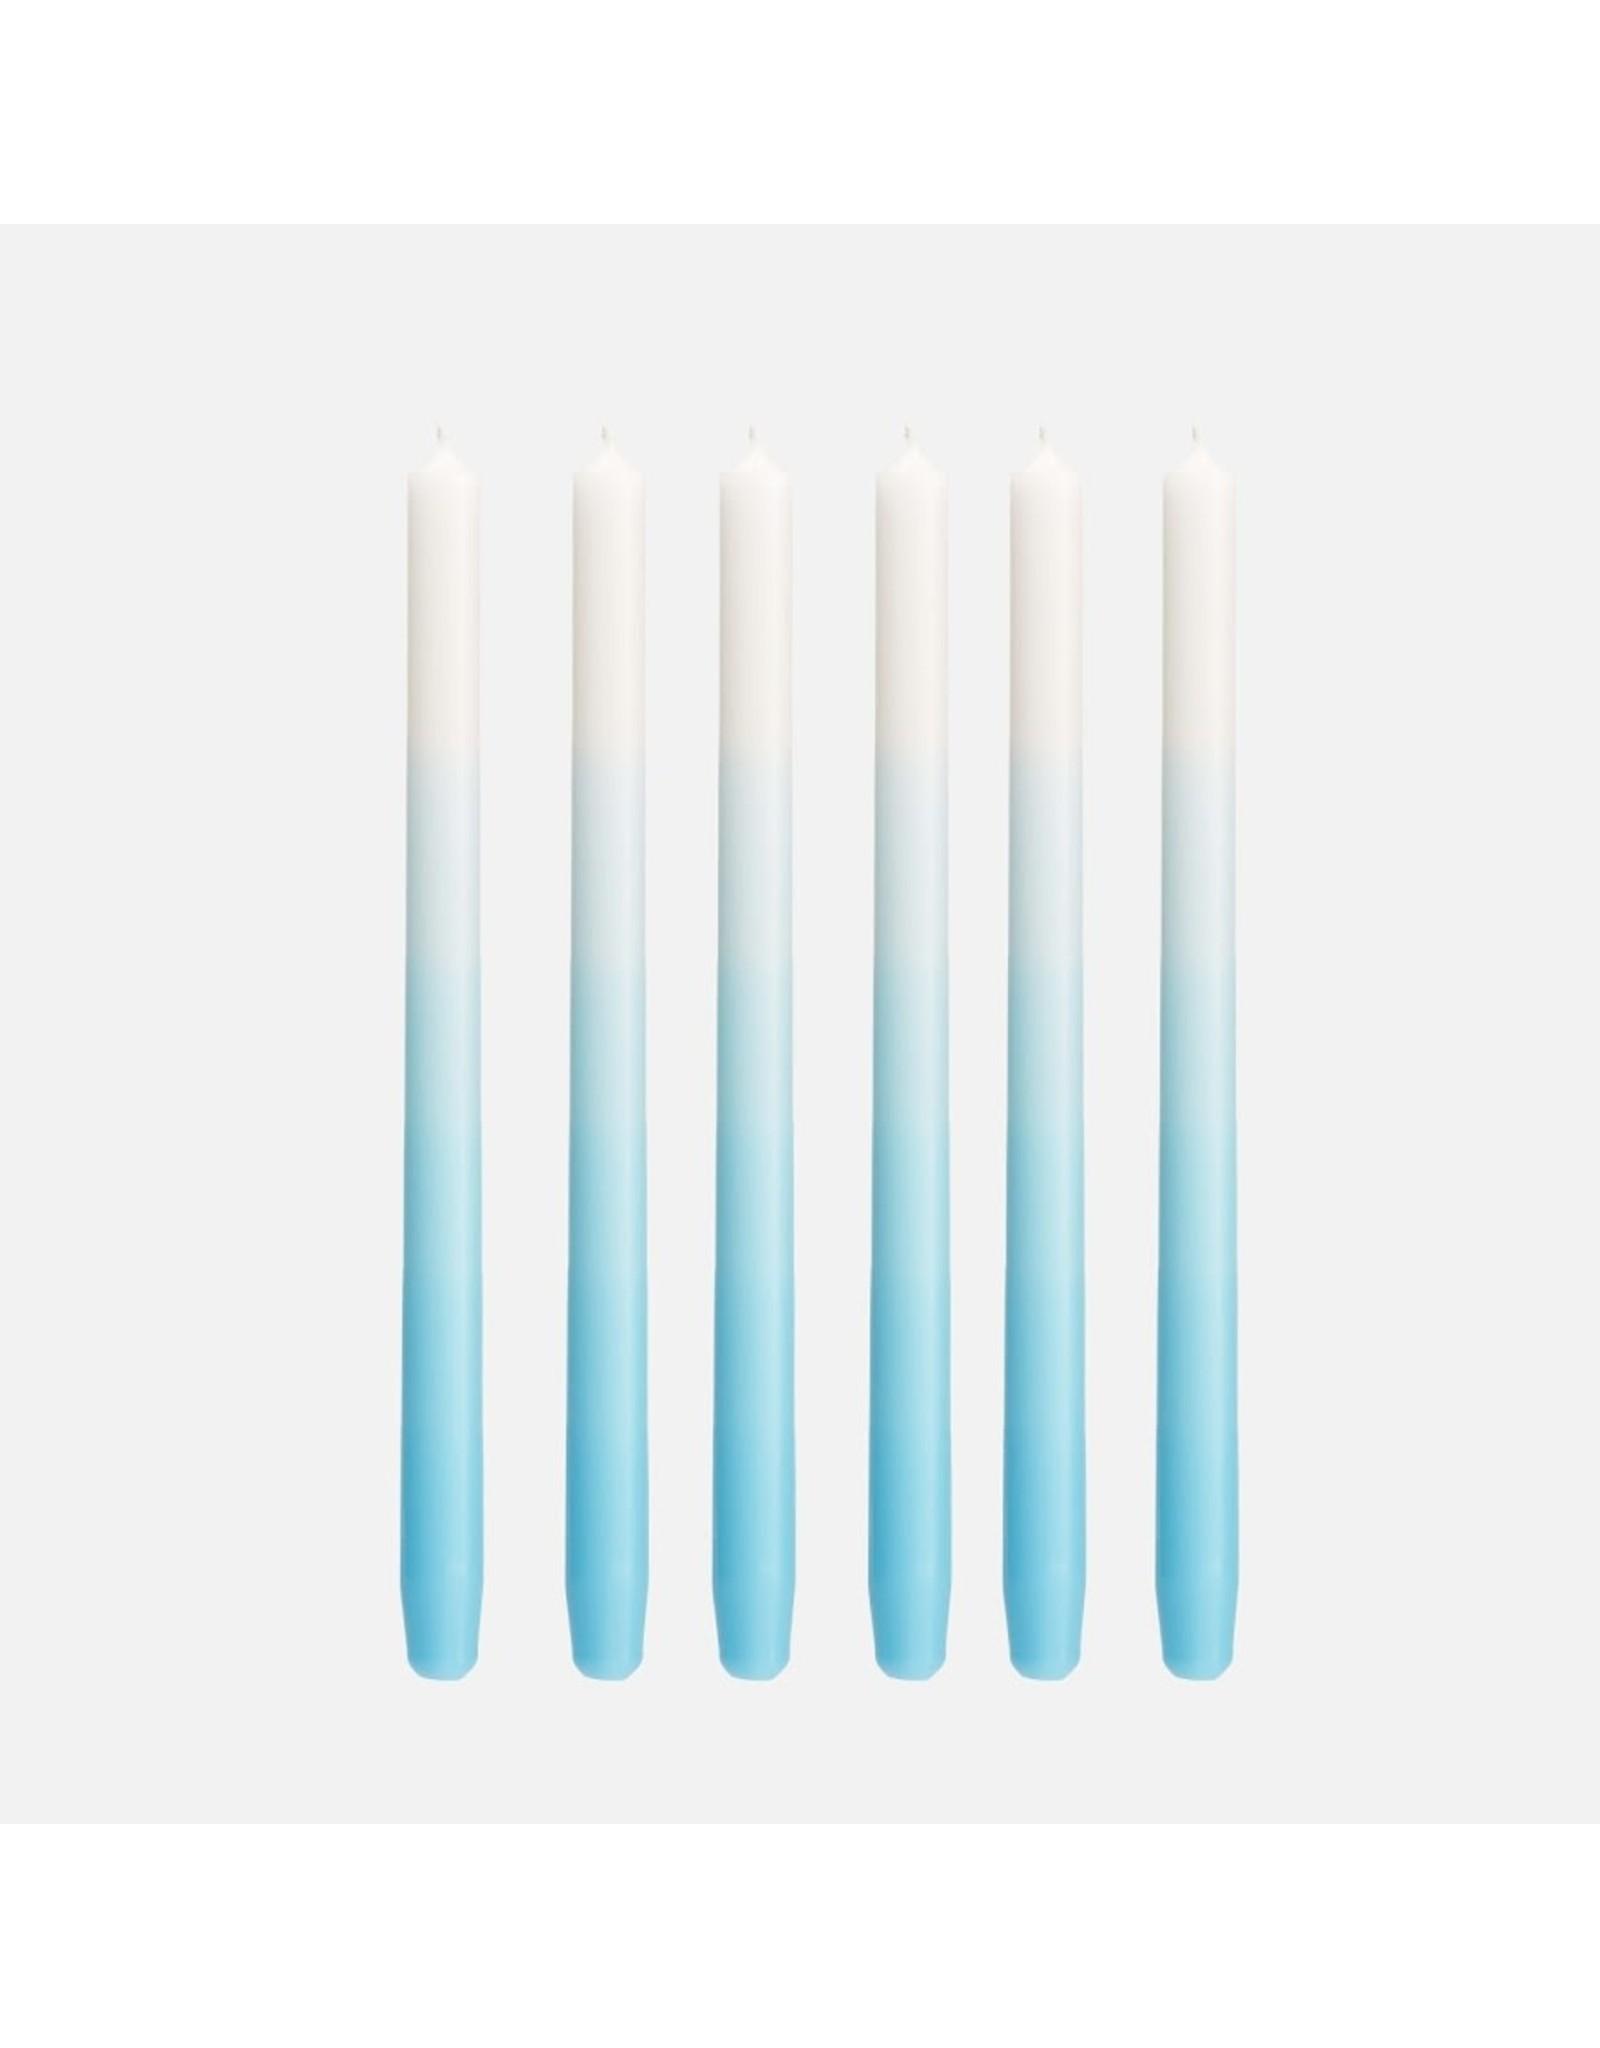 Mo Man Tai Gradient Candle (per piece) Horizon Blue